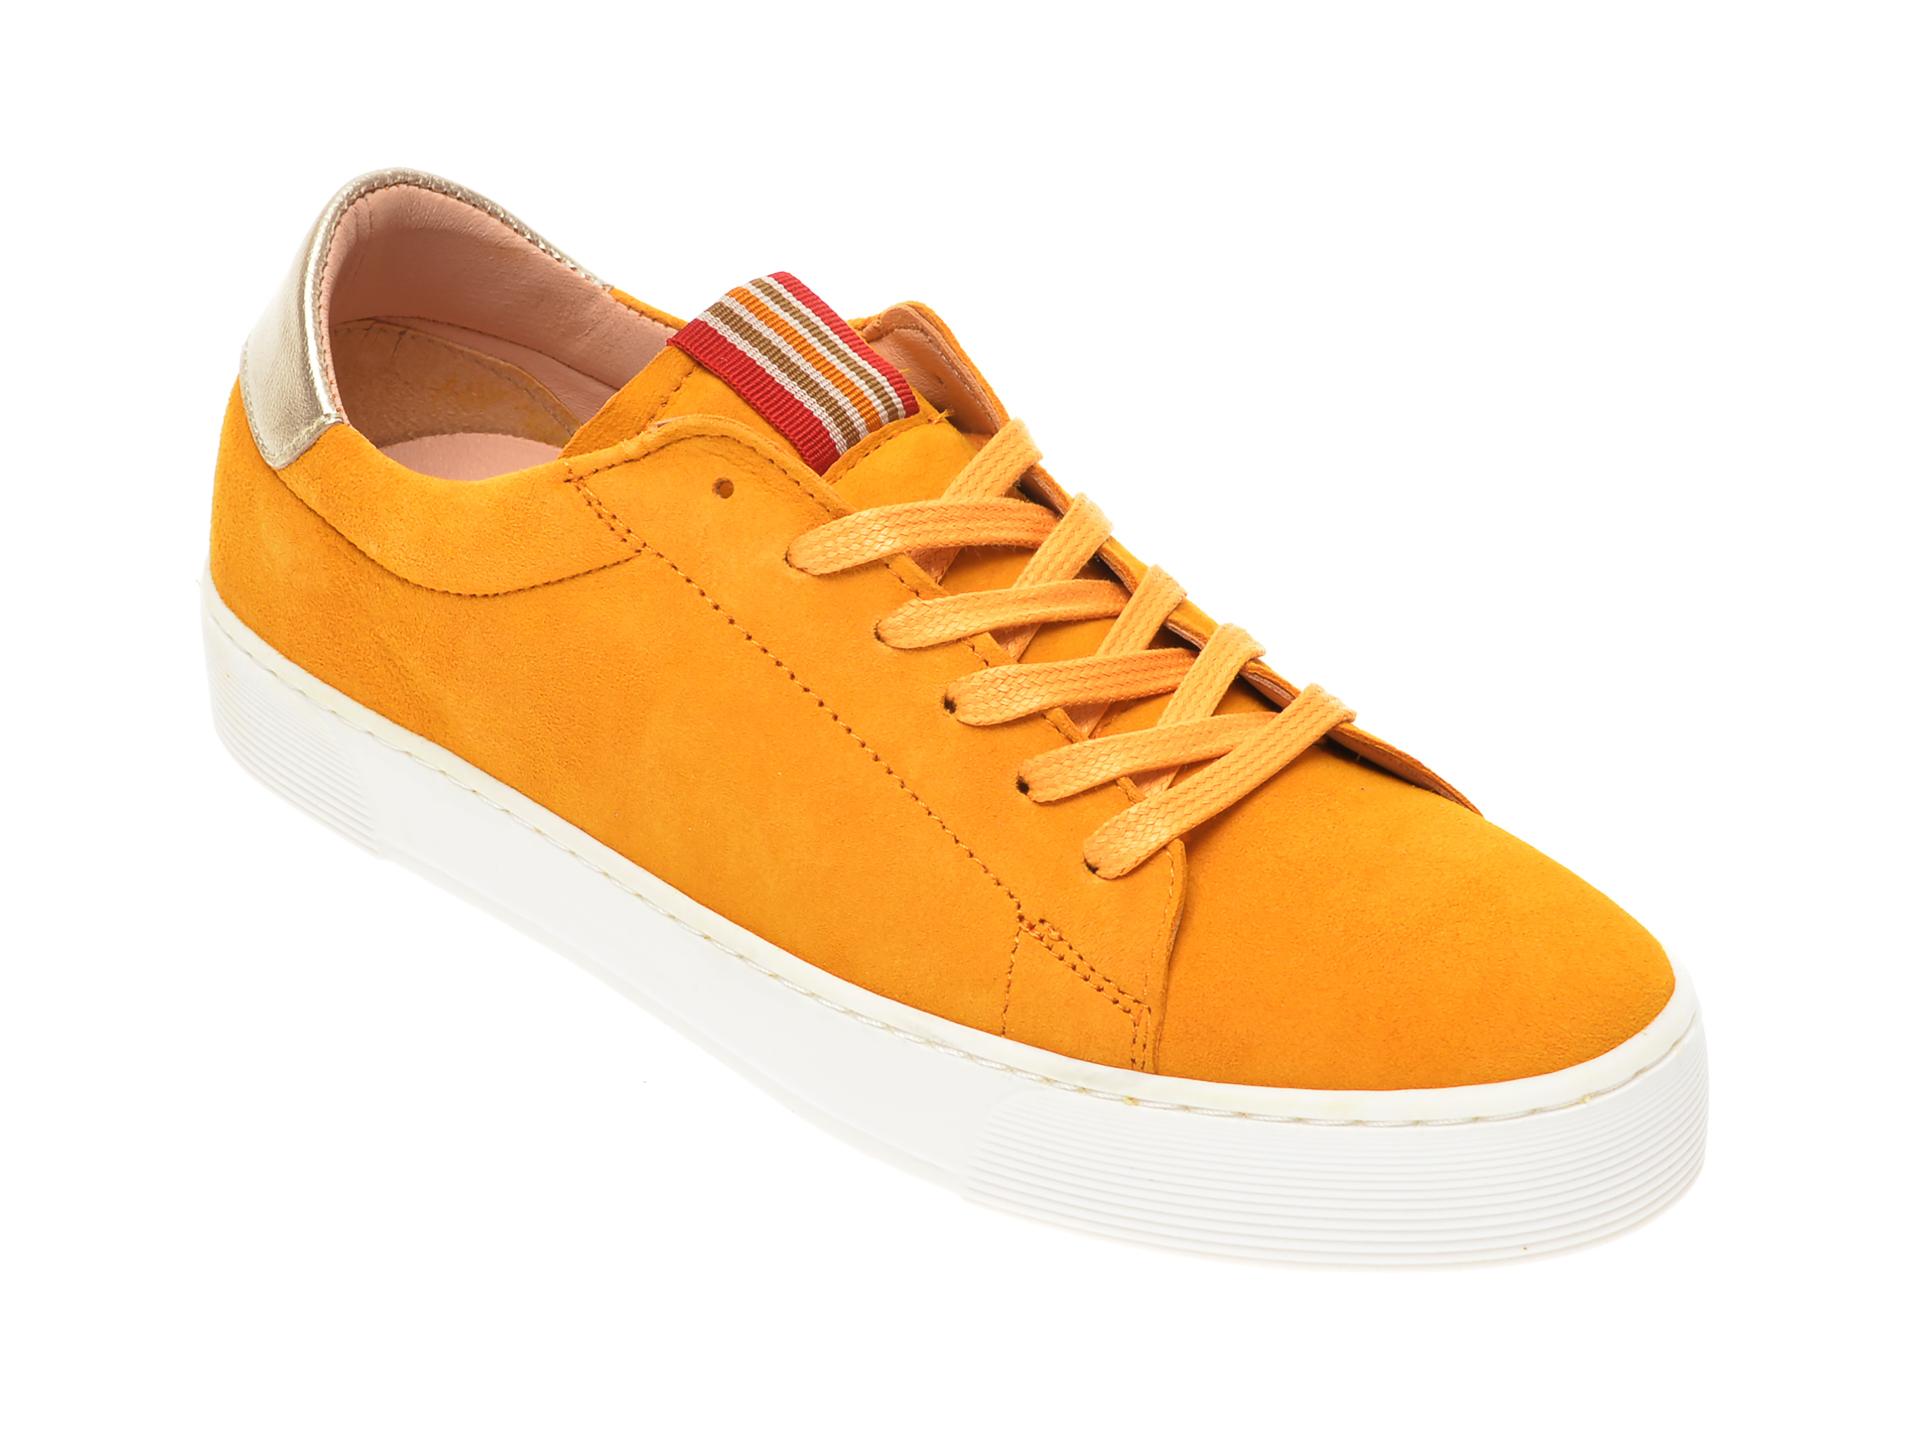 Pantofi sport SALAMANDER galbeni, 55301, din piele intoarsa imagine